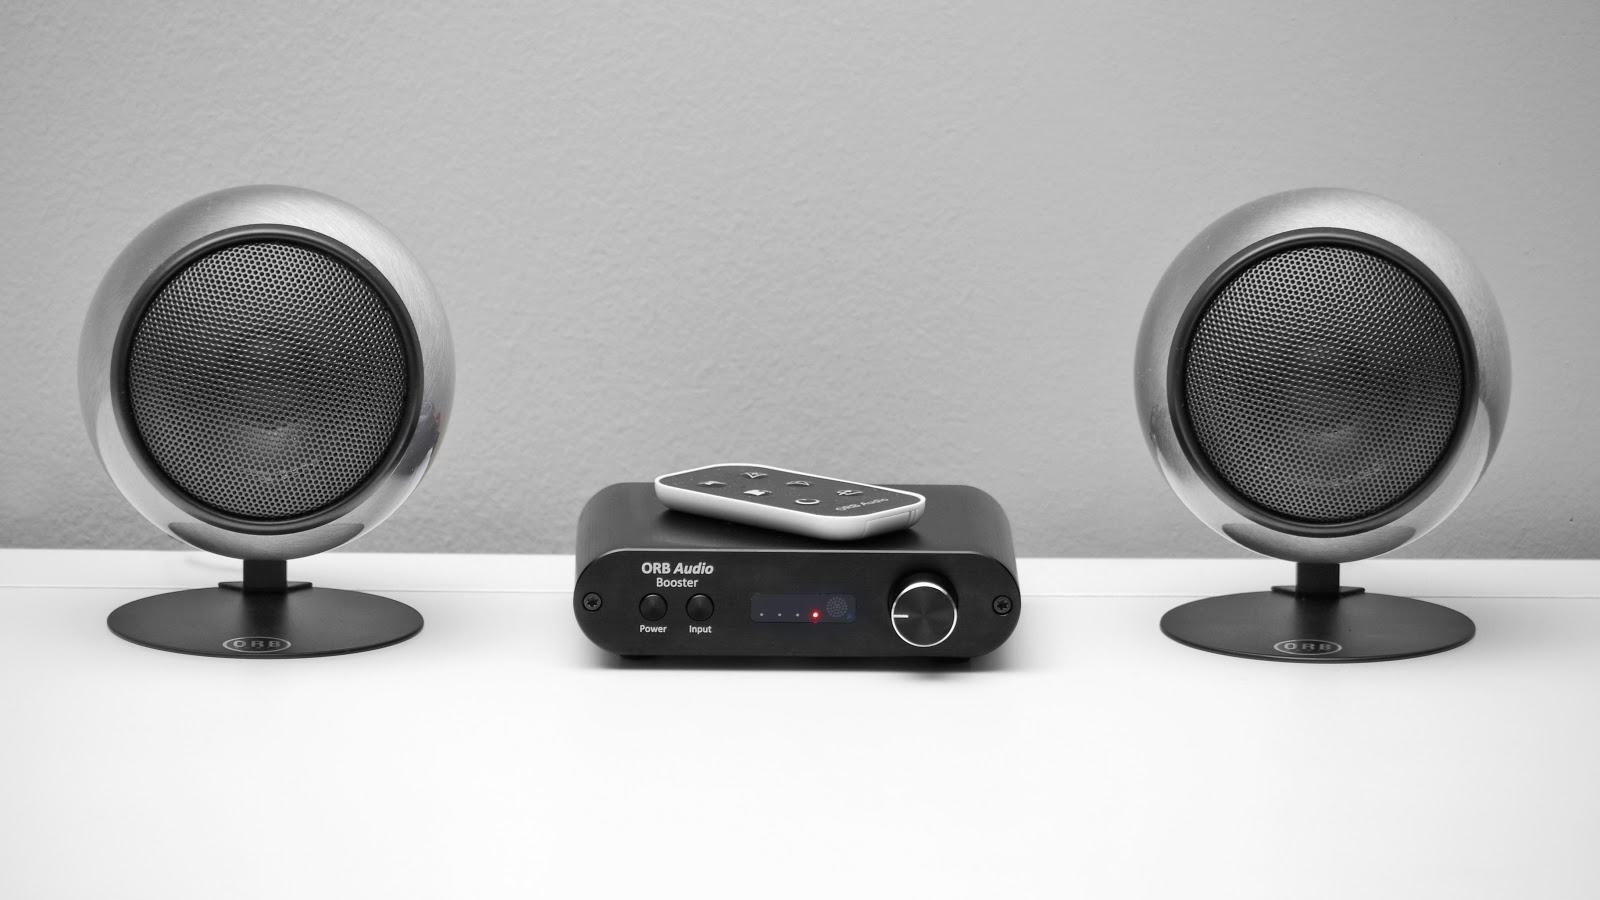 Orb Audio Booster One Soundbar Alternative Steel Reviews Cheap P1060145